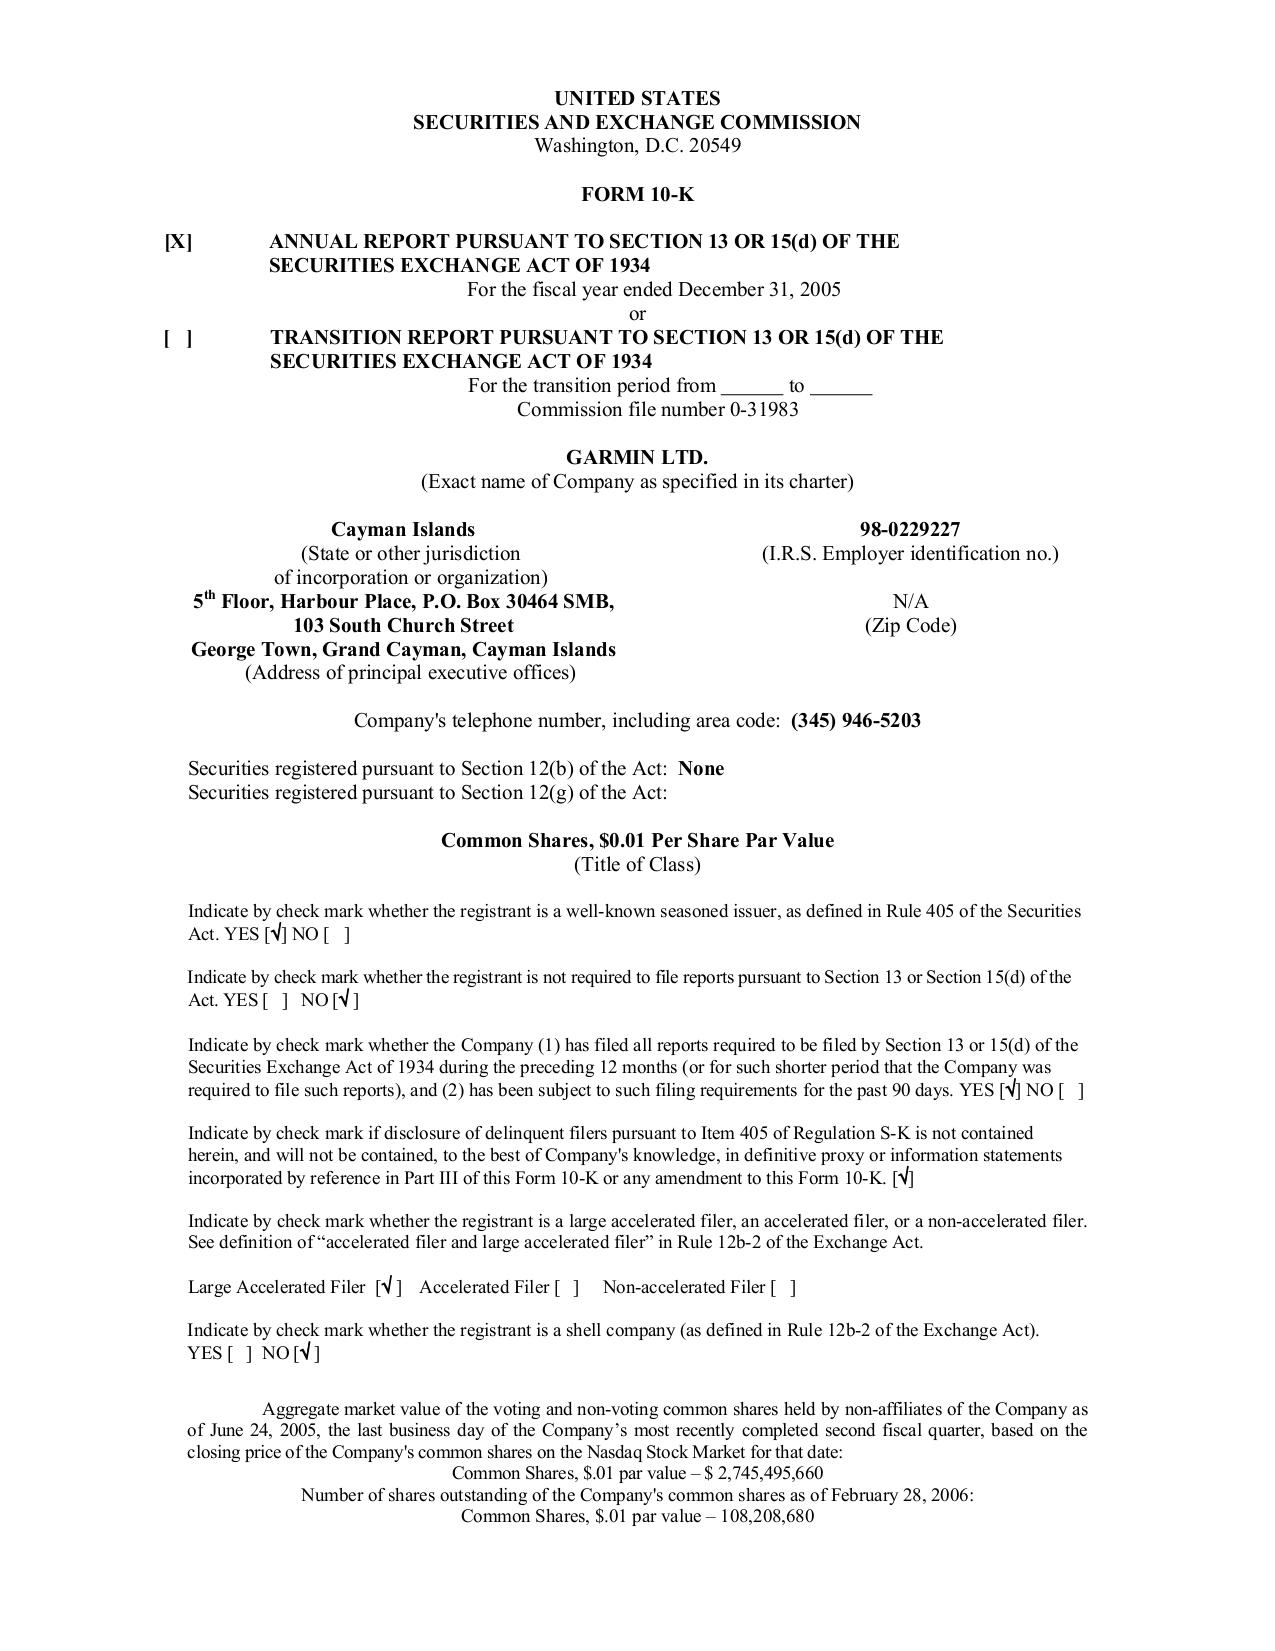 pdf for Raymarine GPS NAV 398 manual